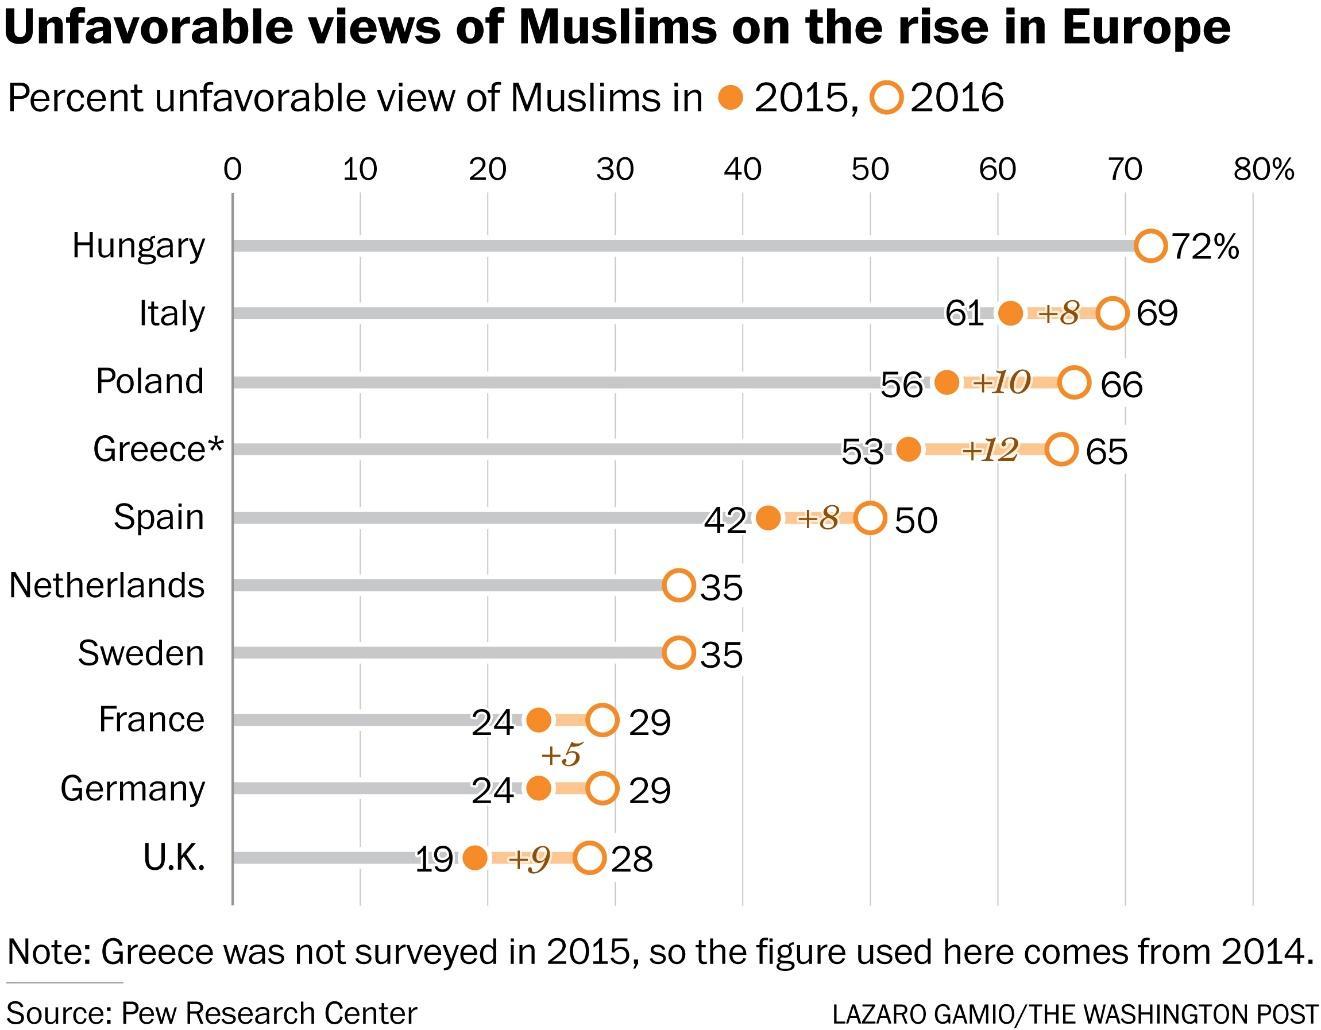 https://img.washingtonpost.com/blogs/worldviews/files/2016/07/2300europemuslims-11.jpg